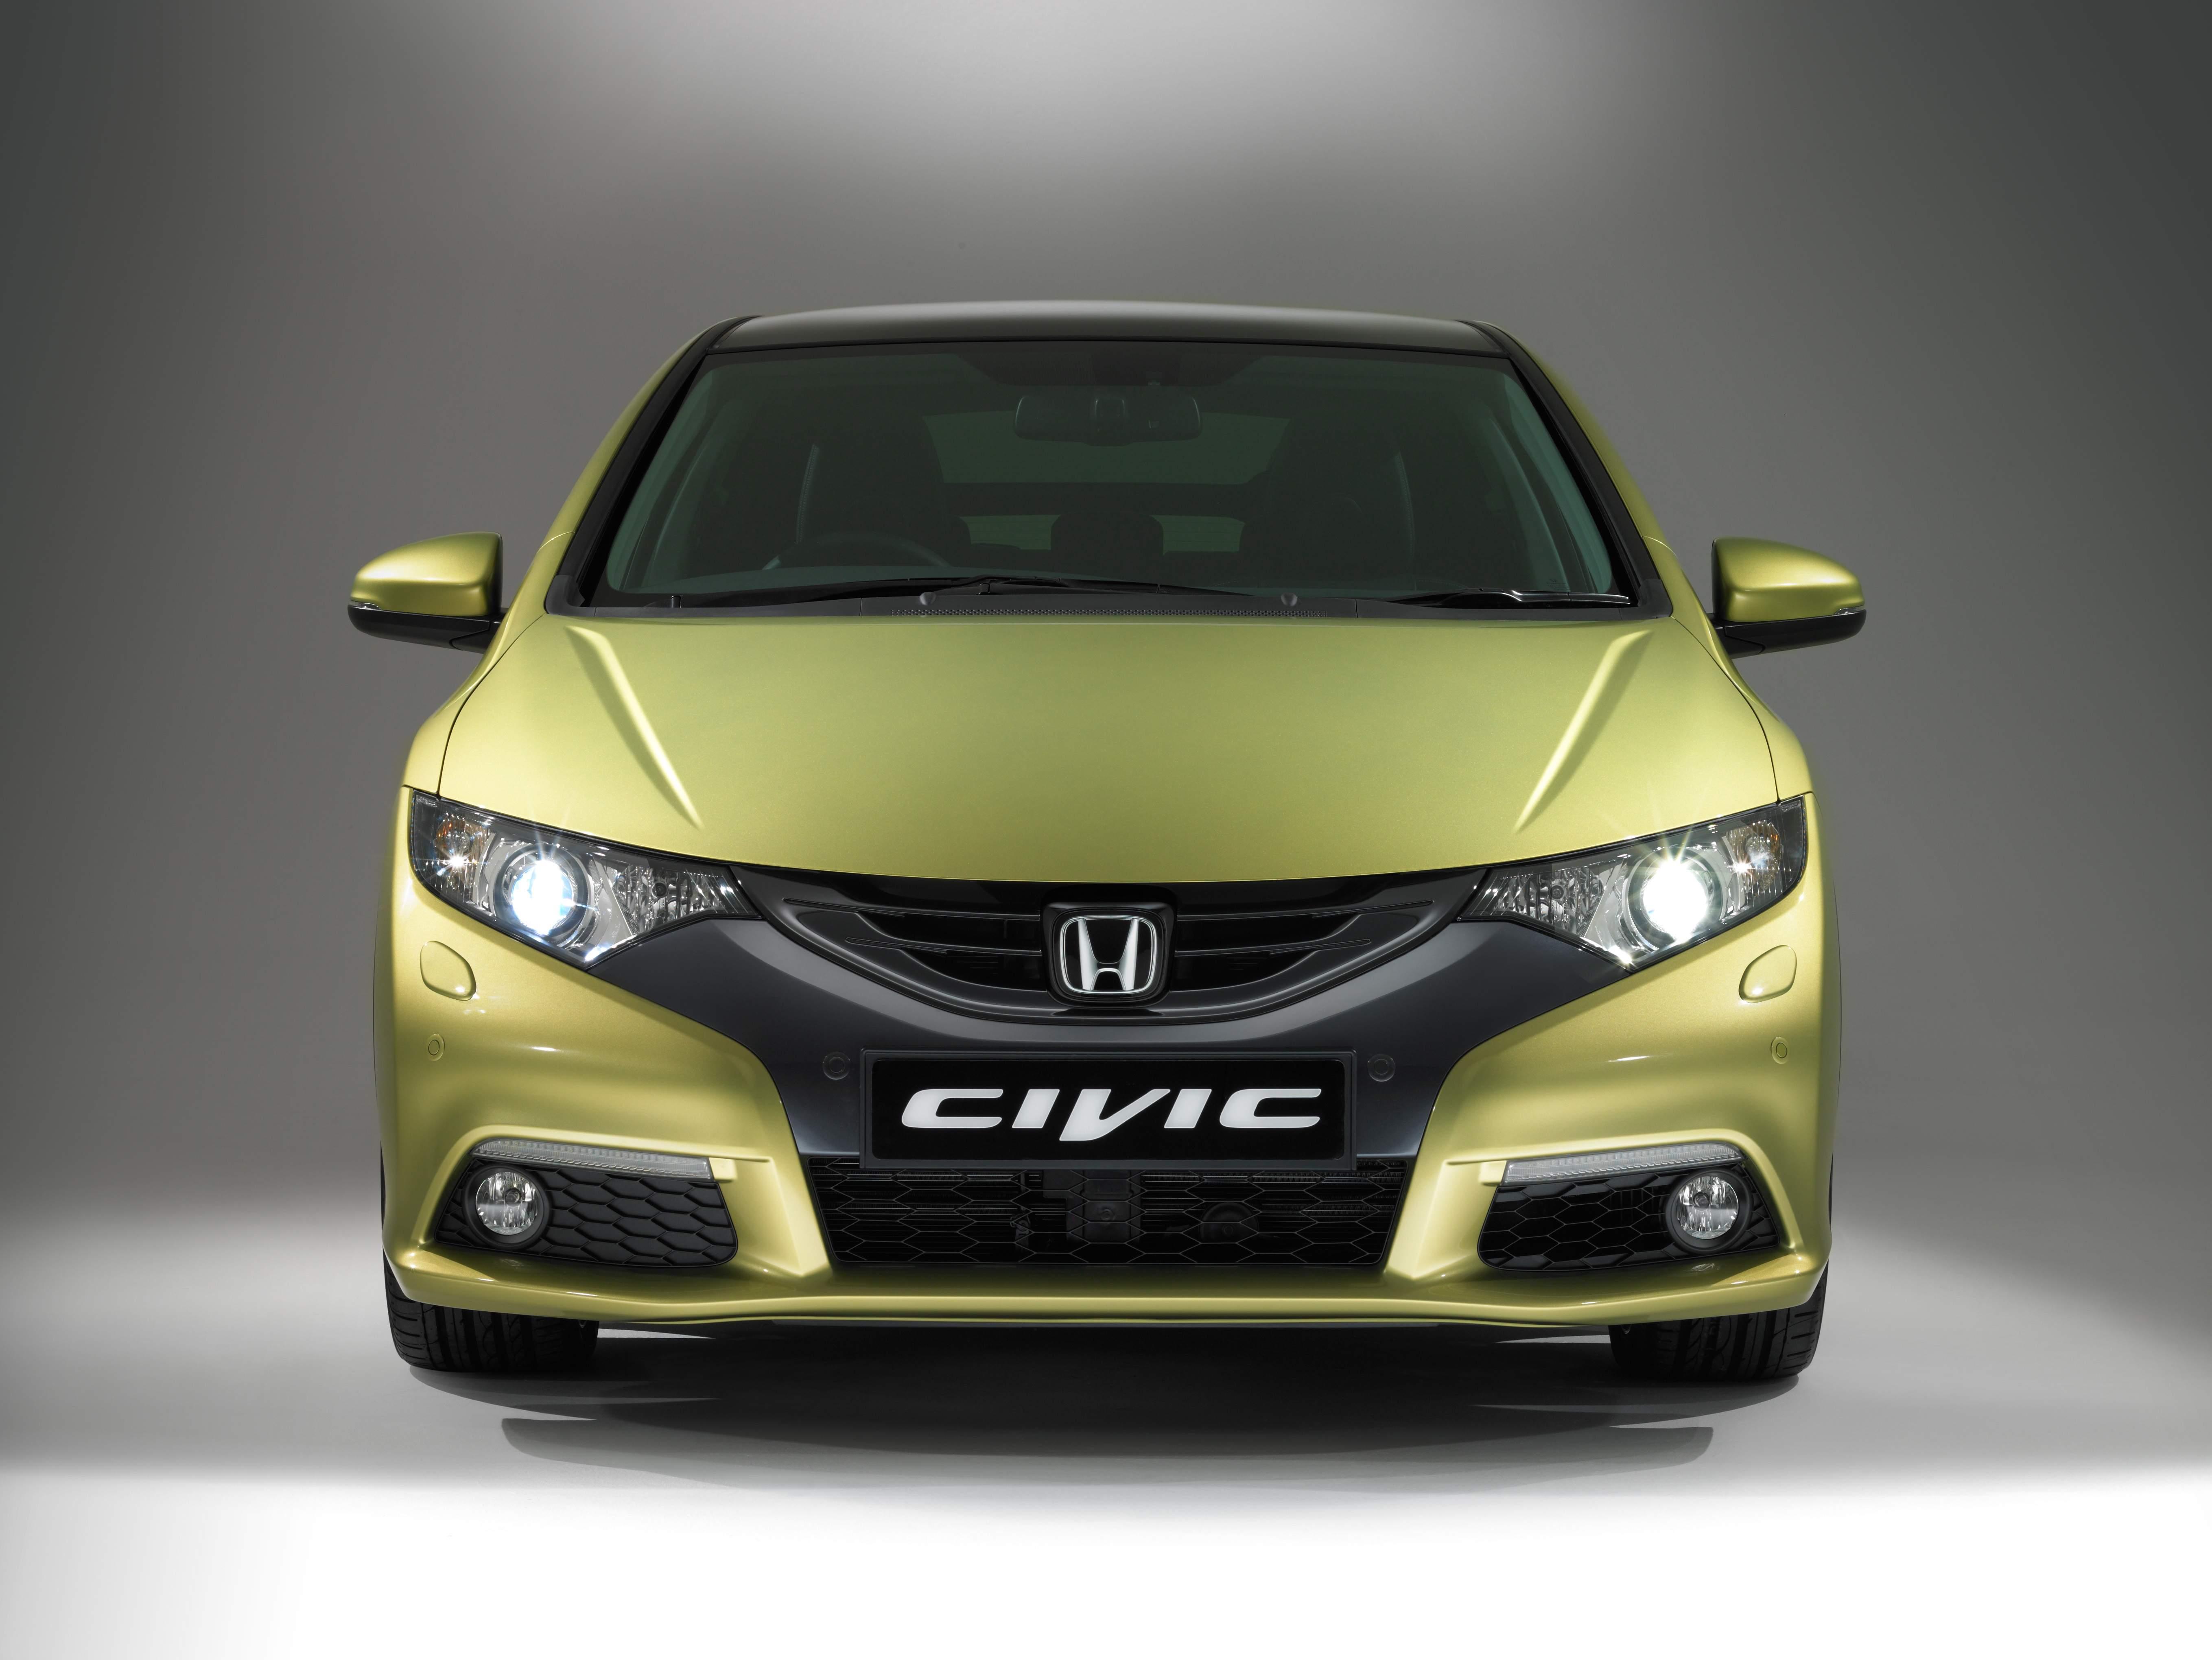 Honda launches new made in swindon civic swindon for Where are honda civics made